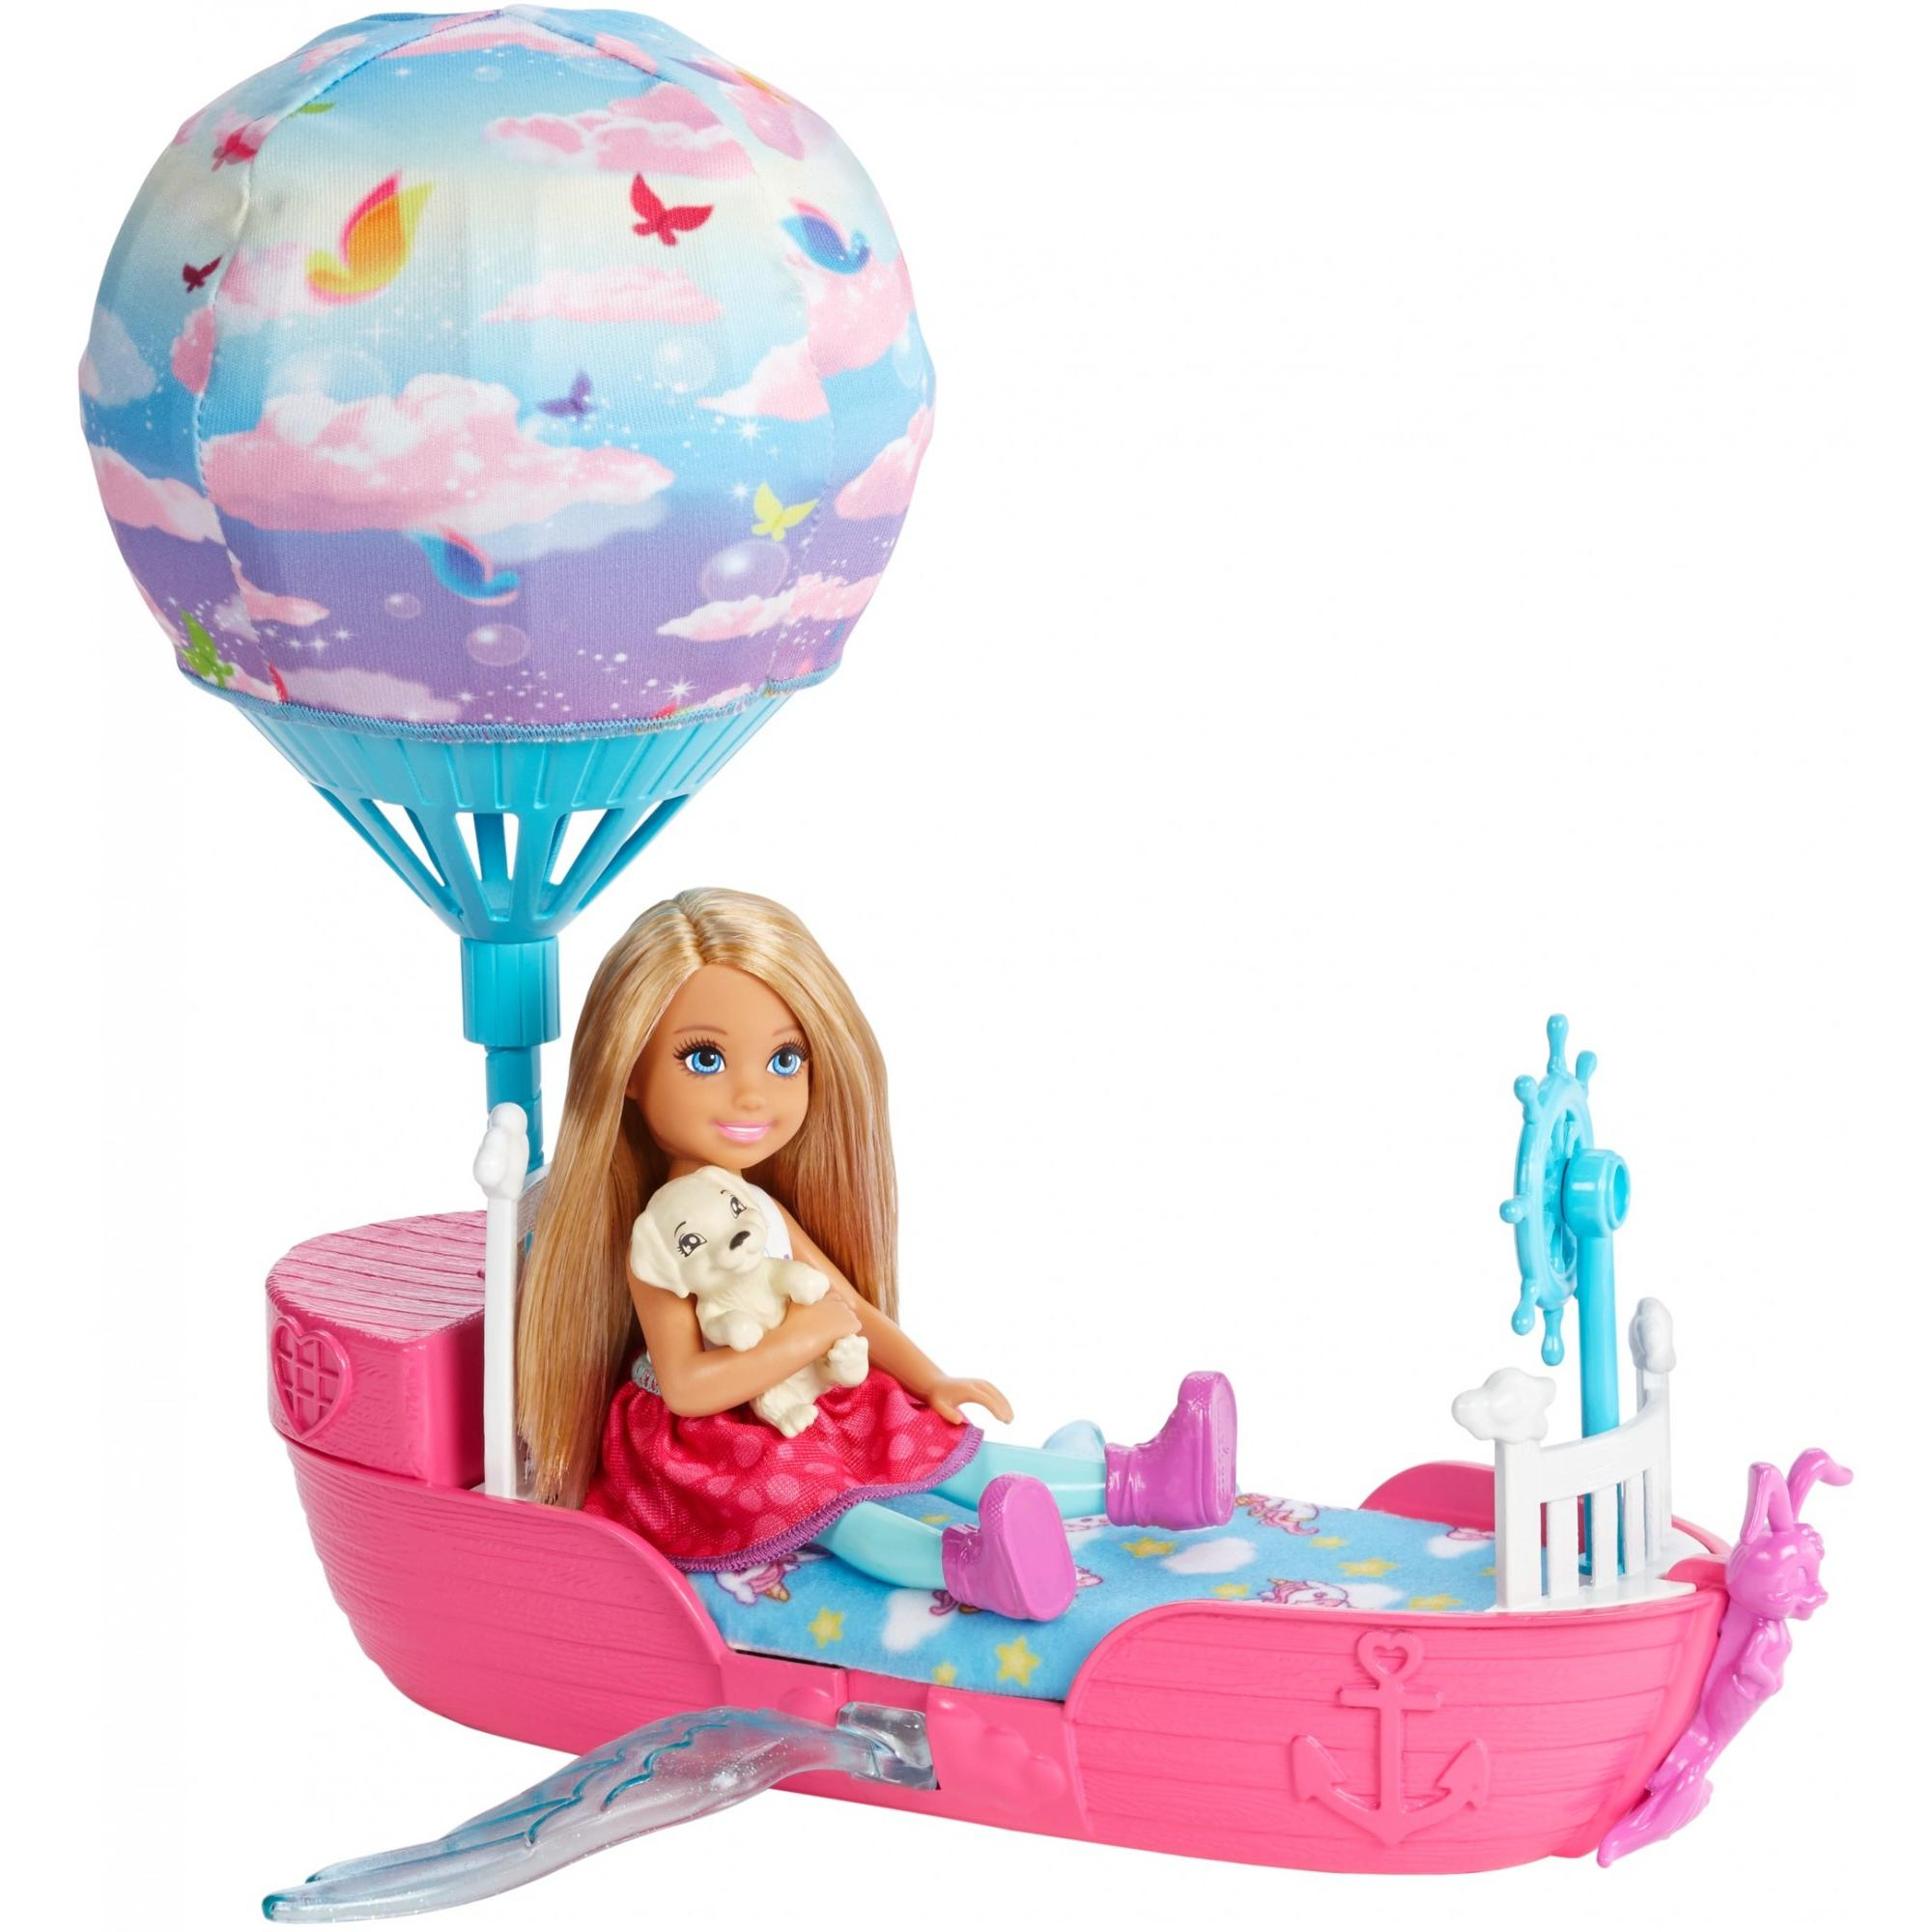 Mattel Inc. Barbie Dreamtopia Chelsea Doll And Magical Dreamboat